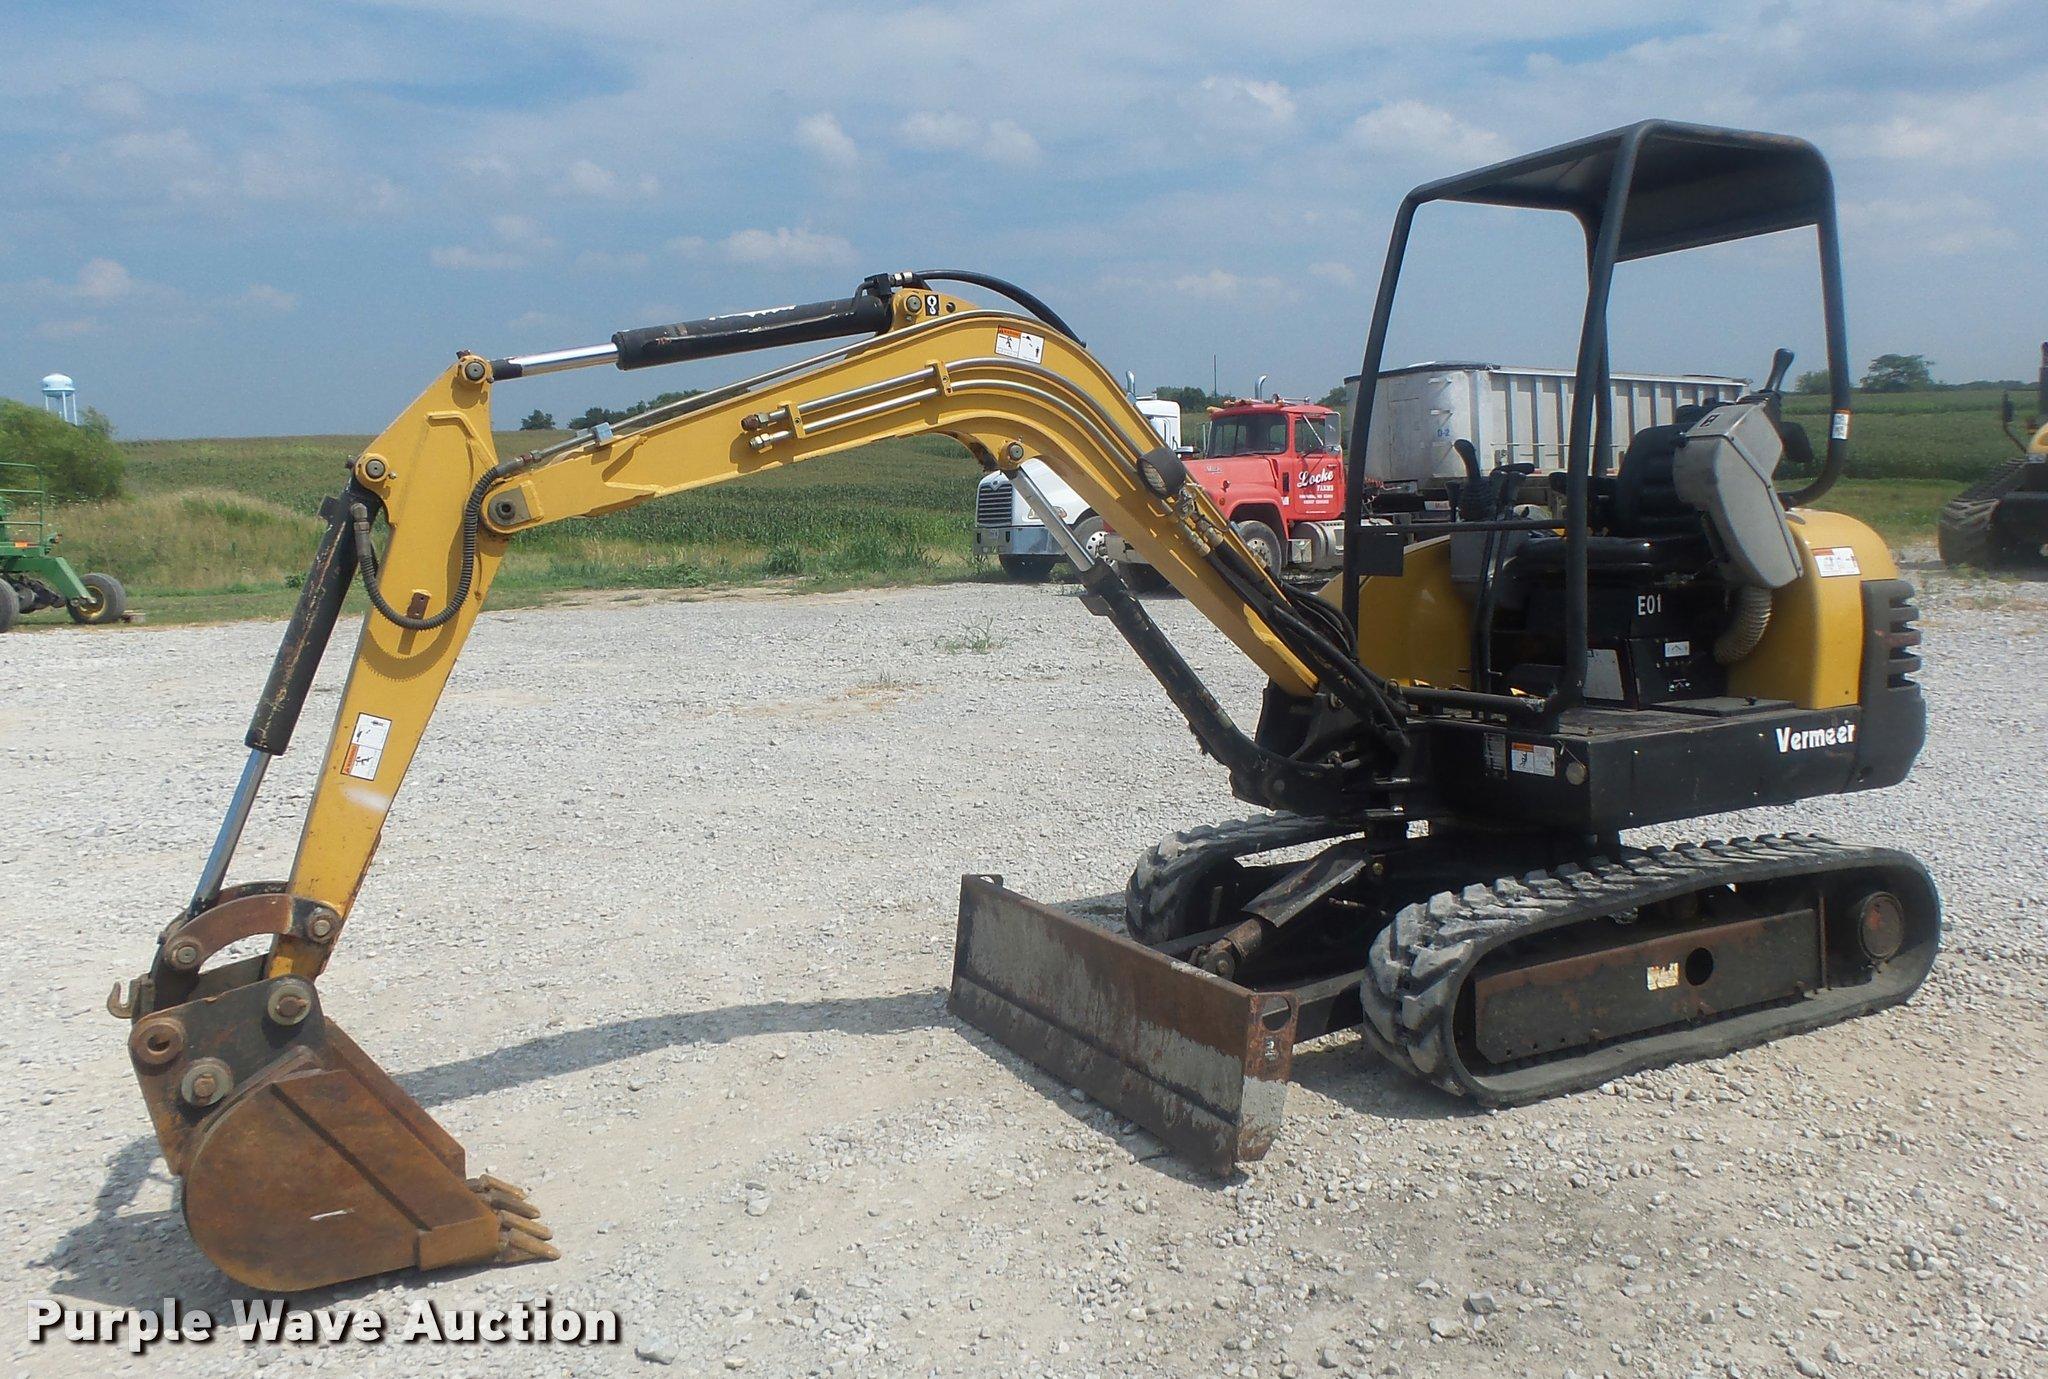 2003 vermeer cx224 mini excavator item db1410 8 17 2017  mini excavator rubber tracks 300x52